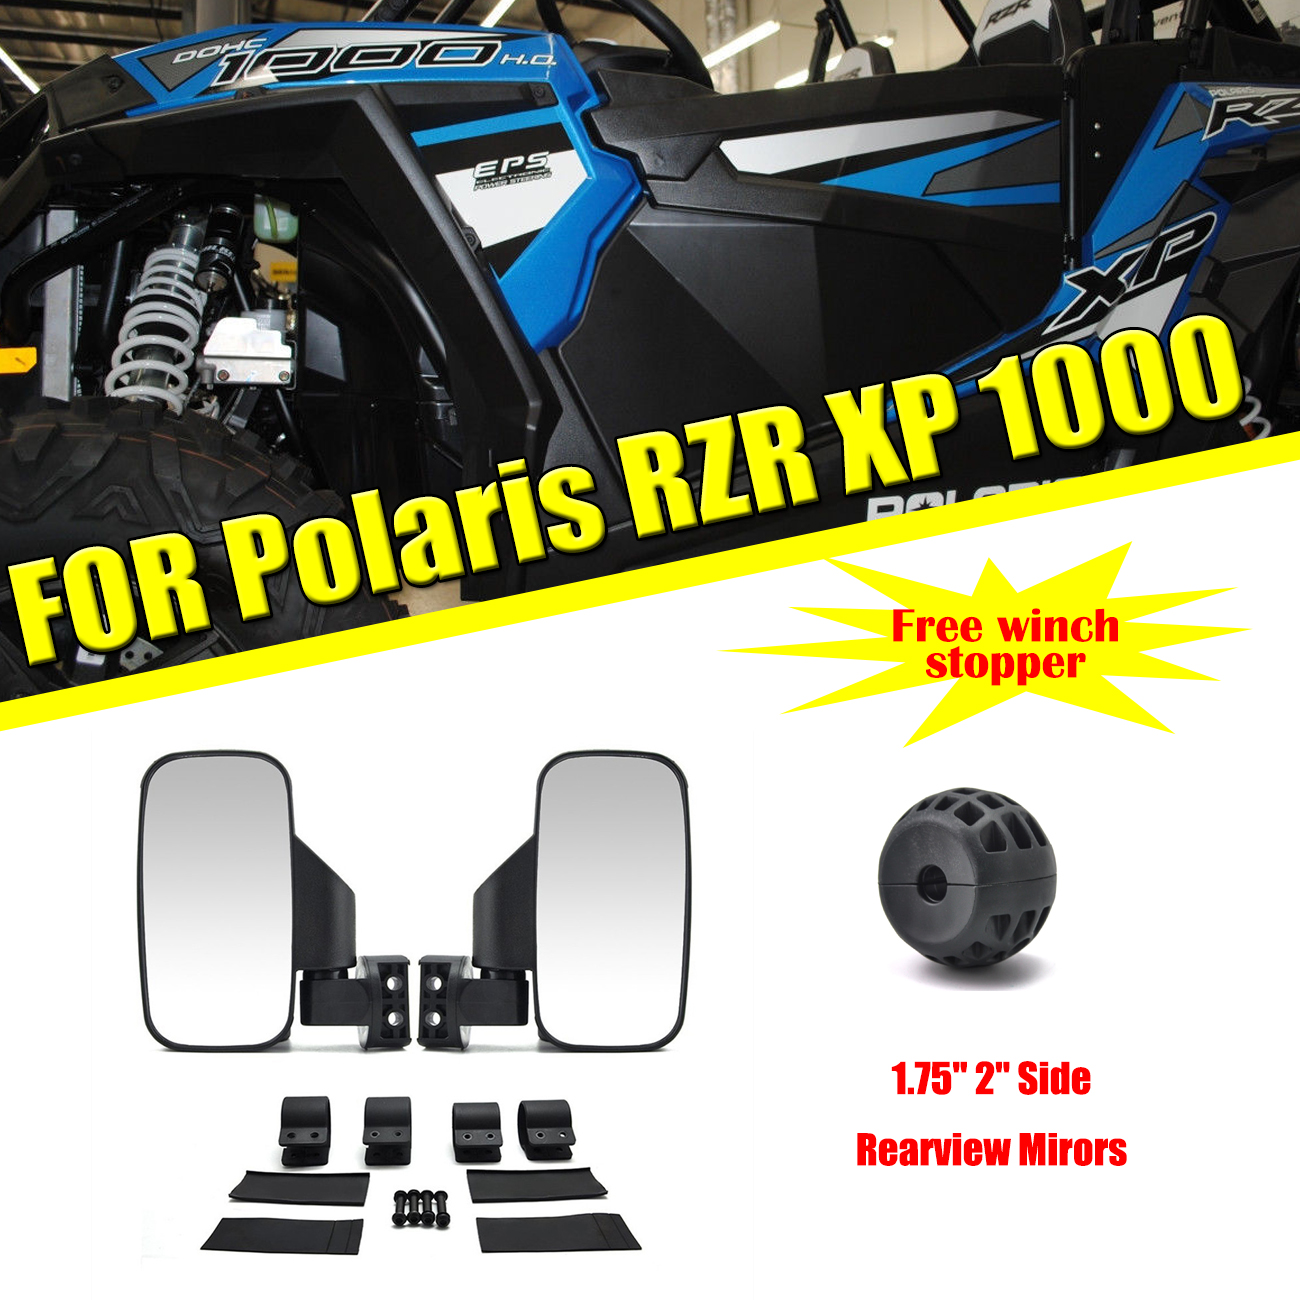 Brake Master Cylinder Assembly fits Polaris RZR 900 2014-2018 OEM 1911515